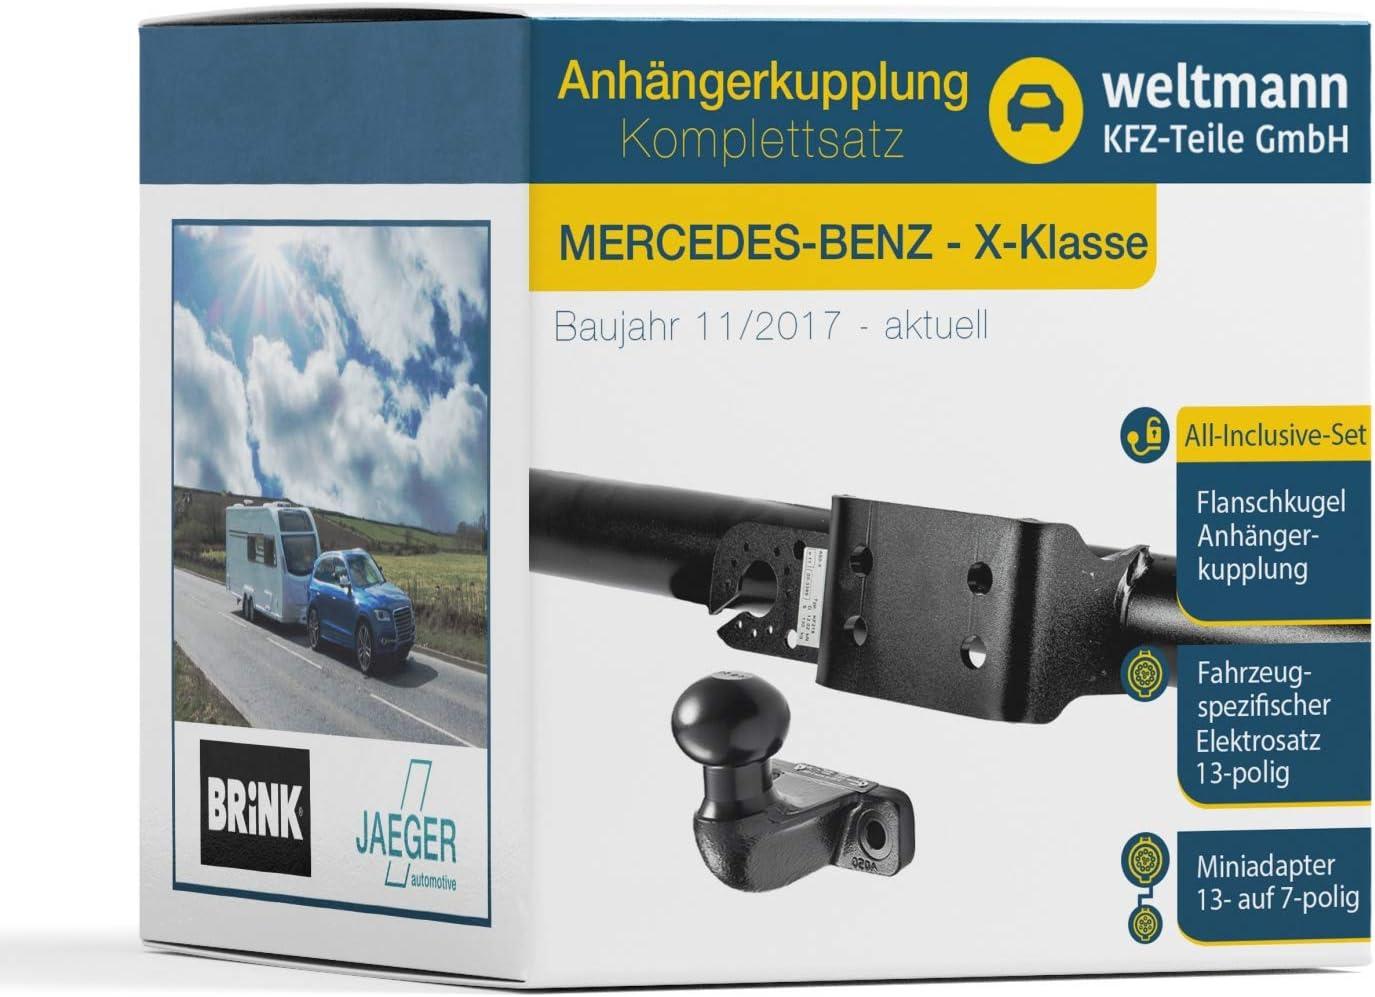 Weltmann 7D500484 - Enganche de remolque rígido con bola de brida y juego eléctrico de 13 polos para Mercedes Benz Clase X W 470